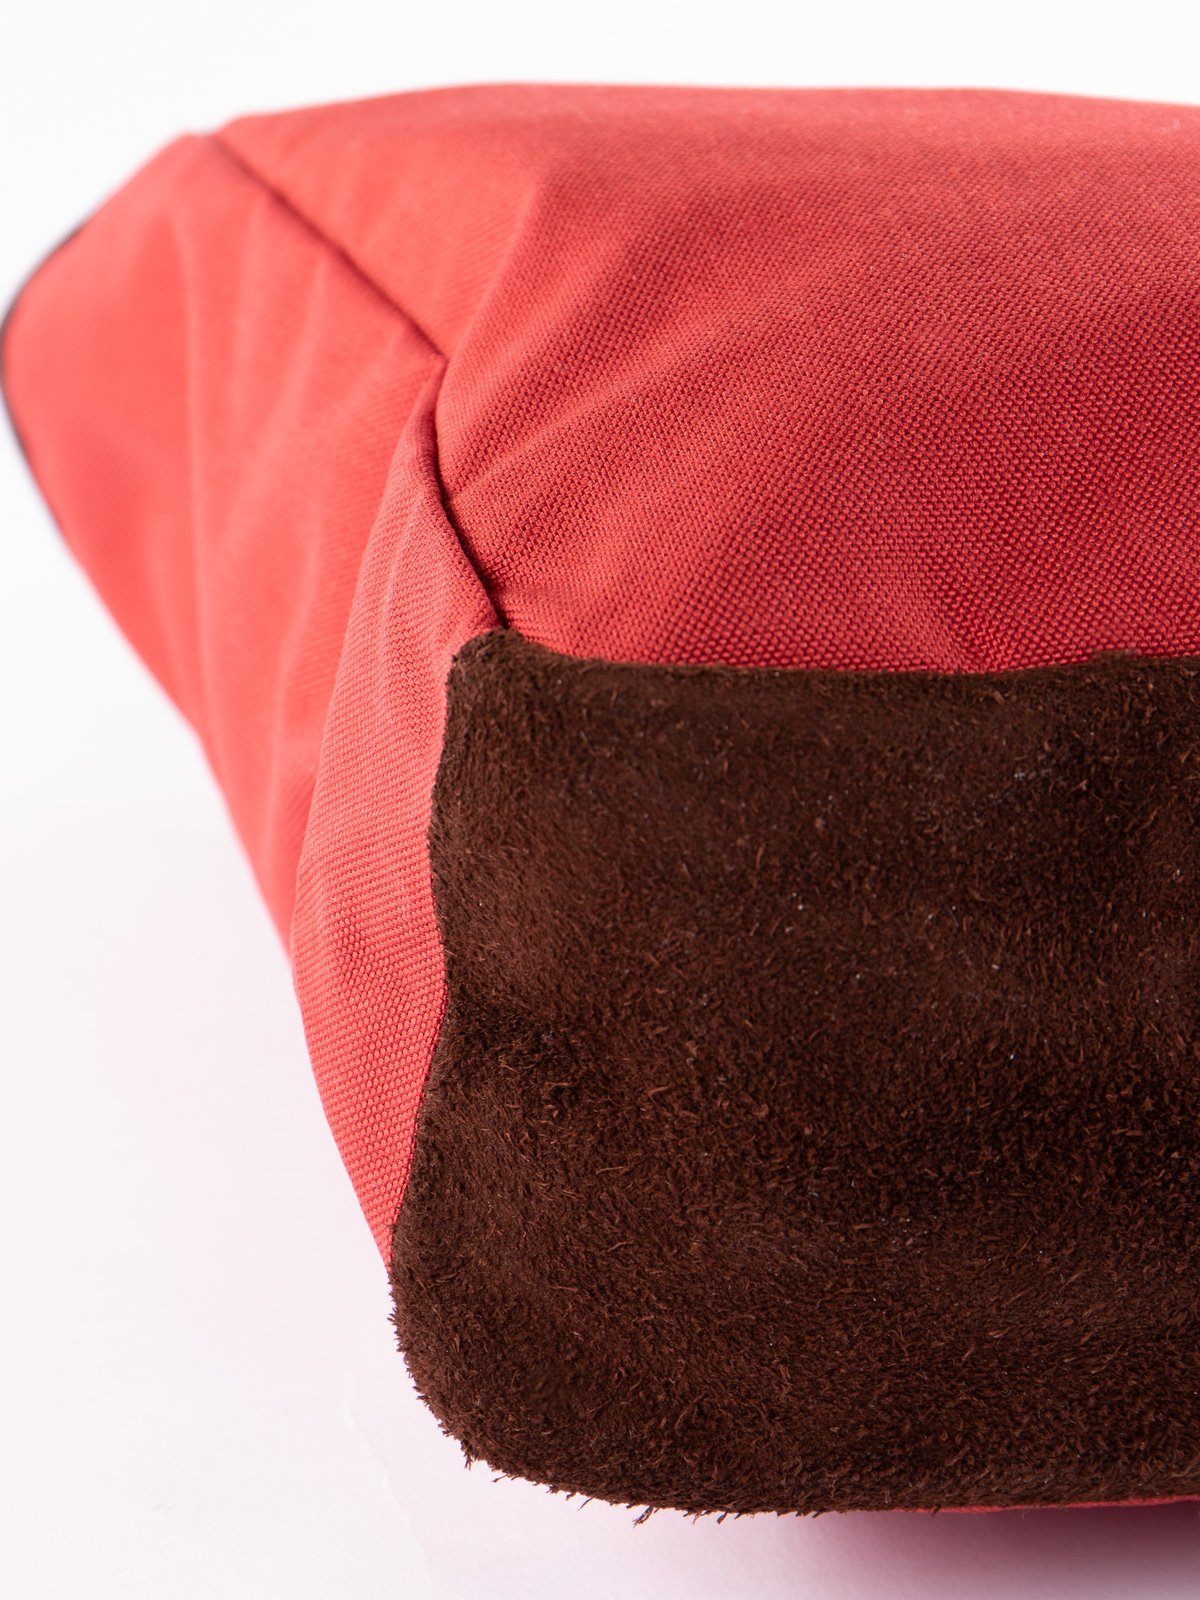 Red Cordura Daytripper Tote - Image 3